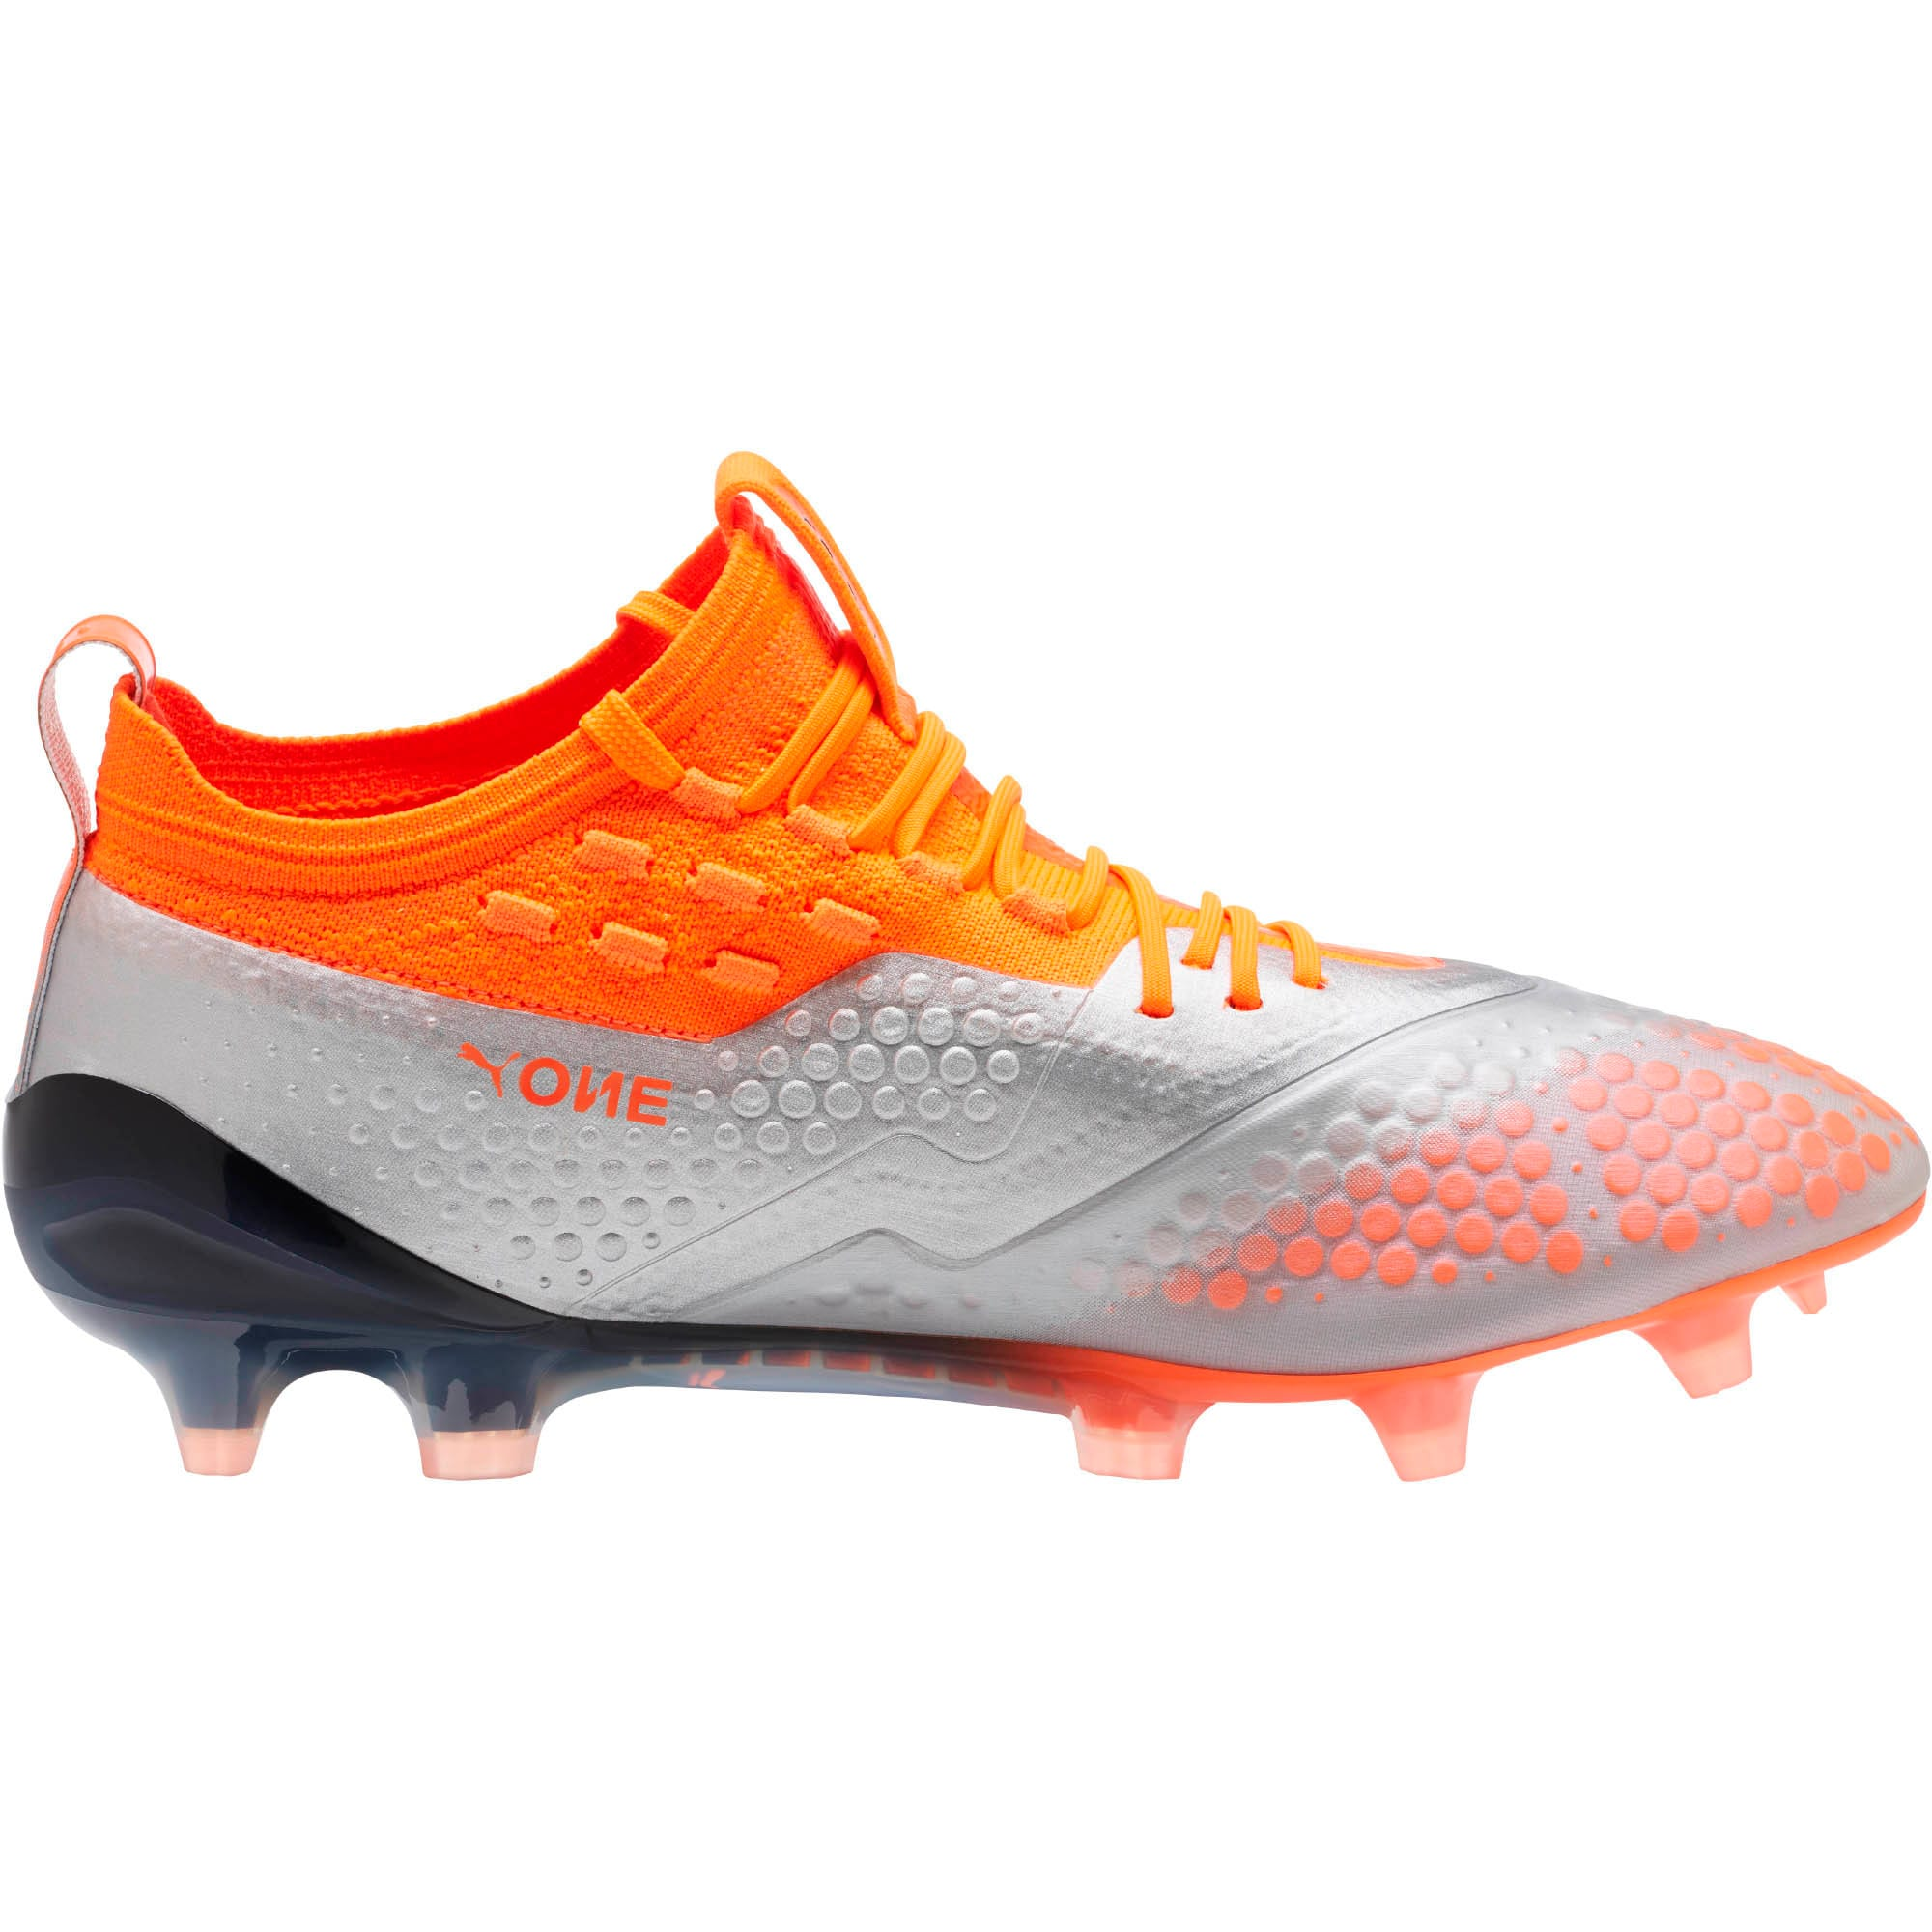 Thumbnail 3 of PUMA ONE 1 FG/AG Men's Soccer Cleats, Silver-Orange-Black, medium